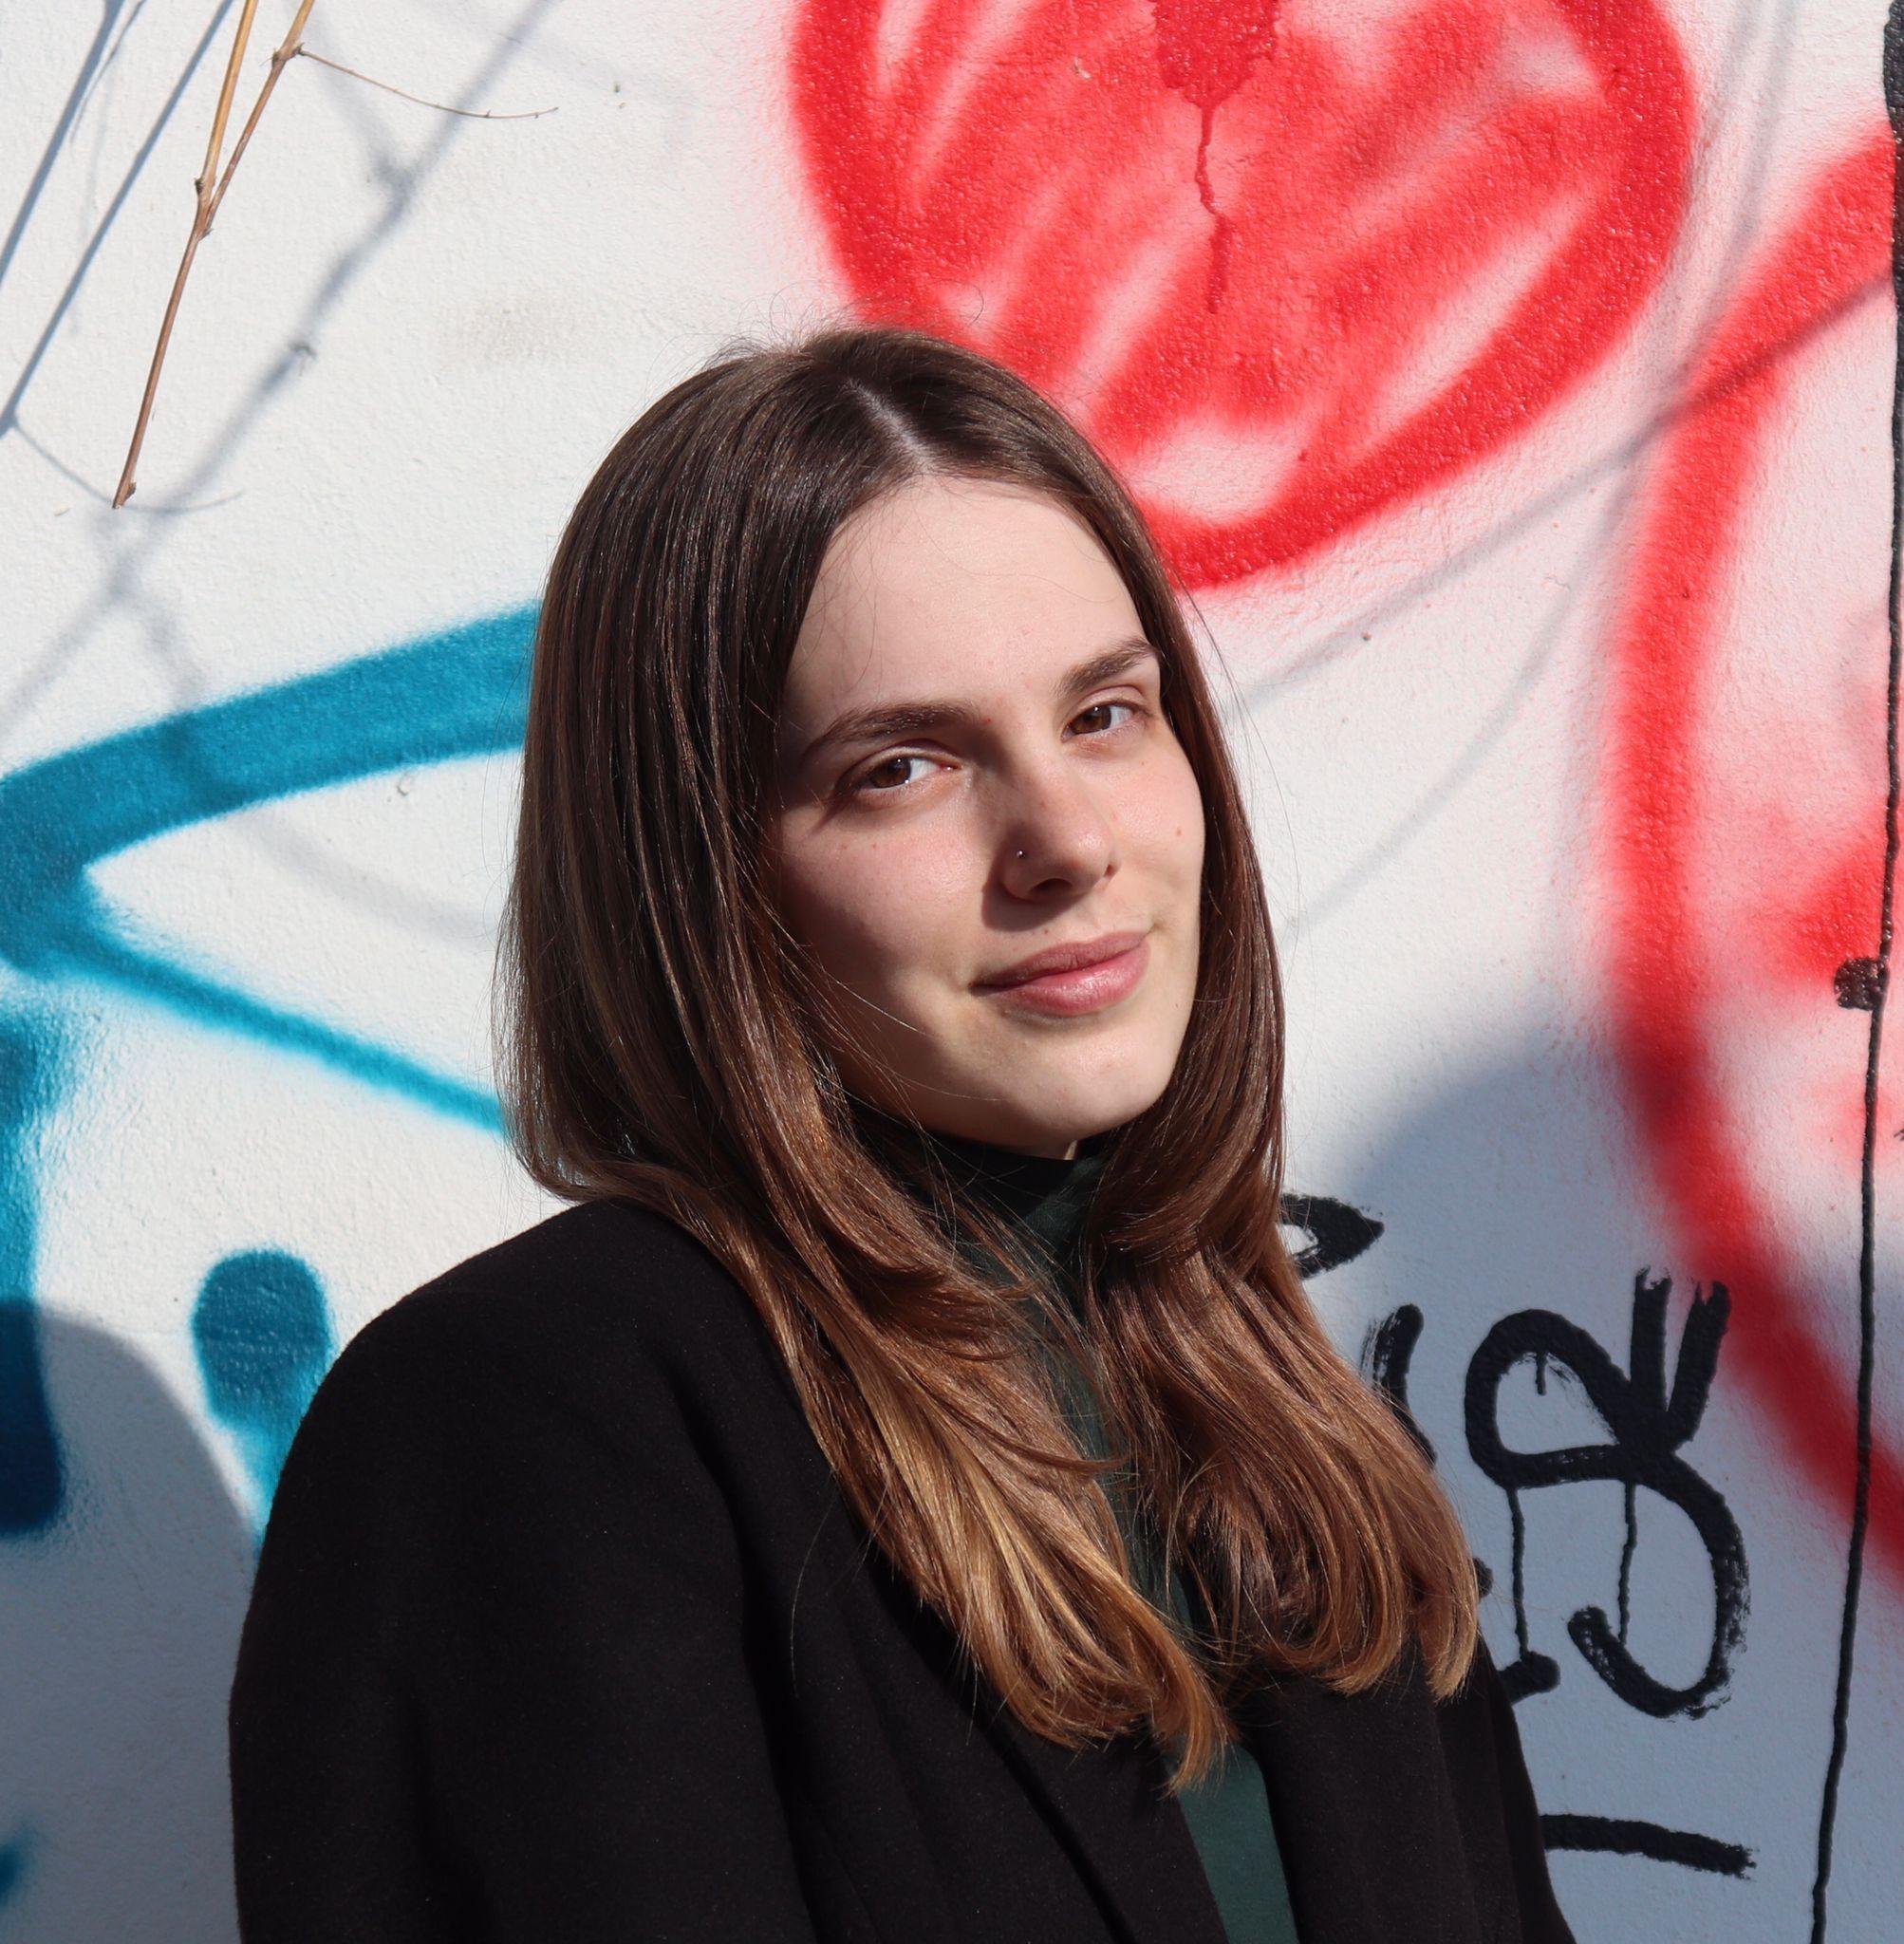 Ines Teodosijević